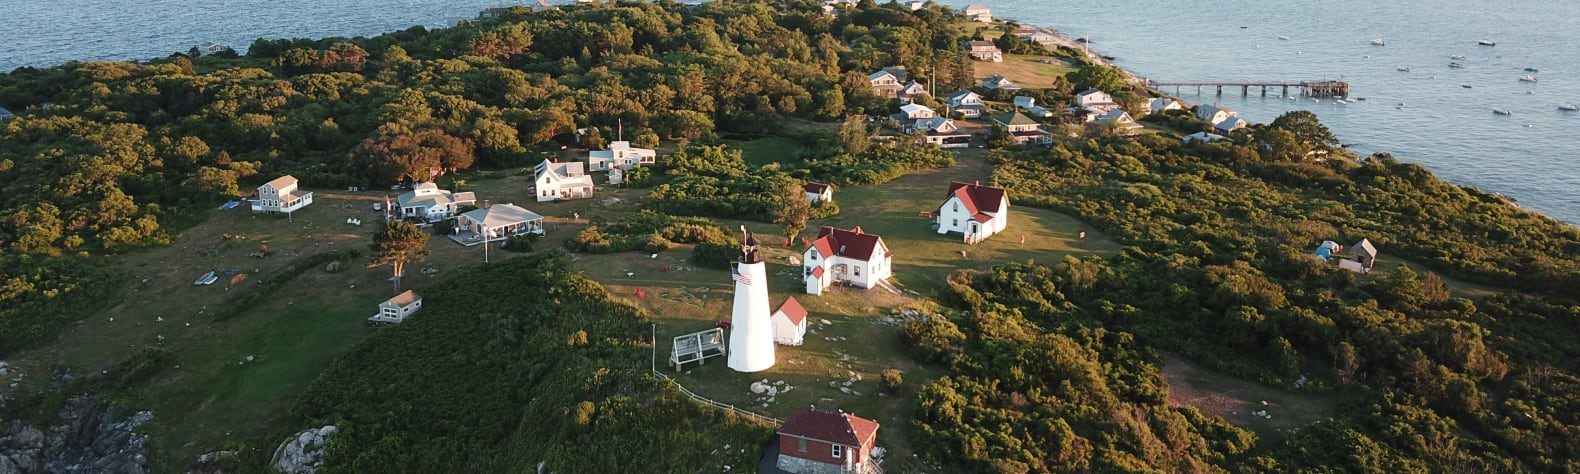 Bakers Island Light Campsite